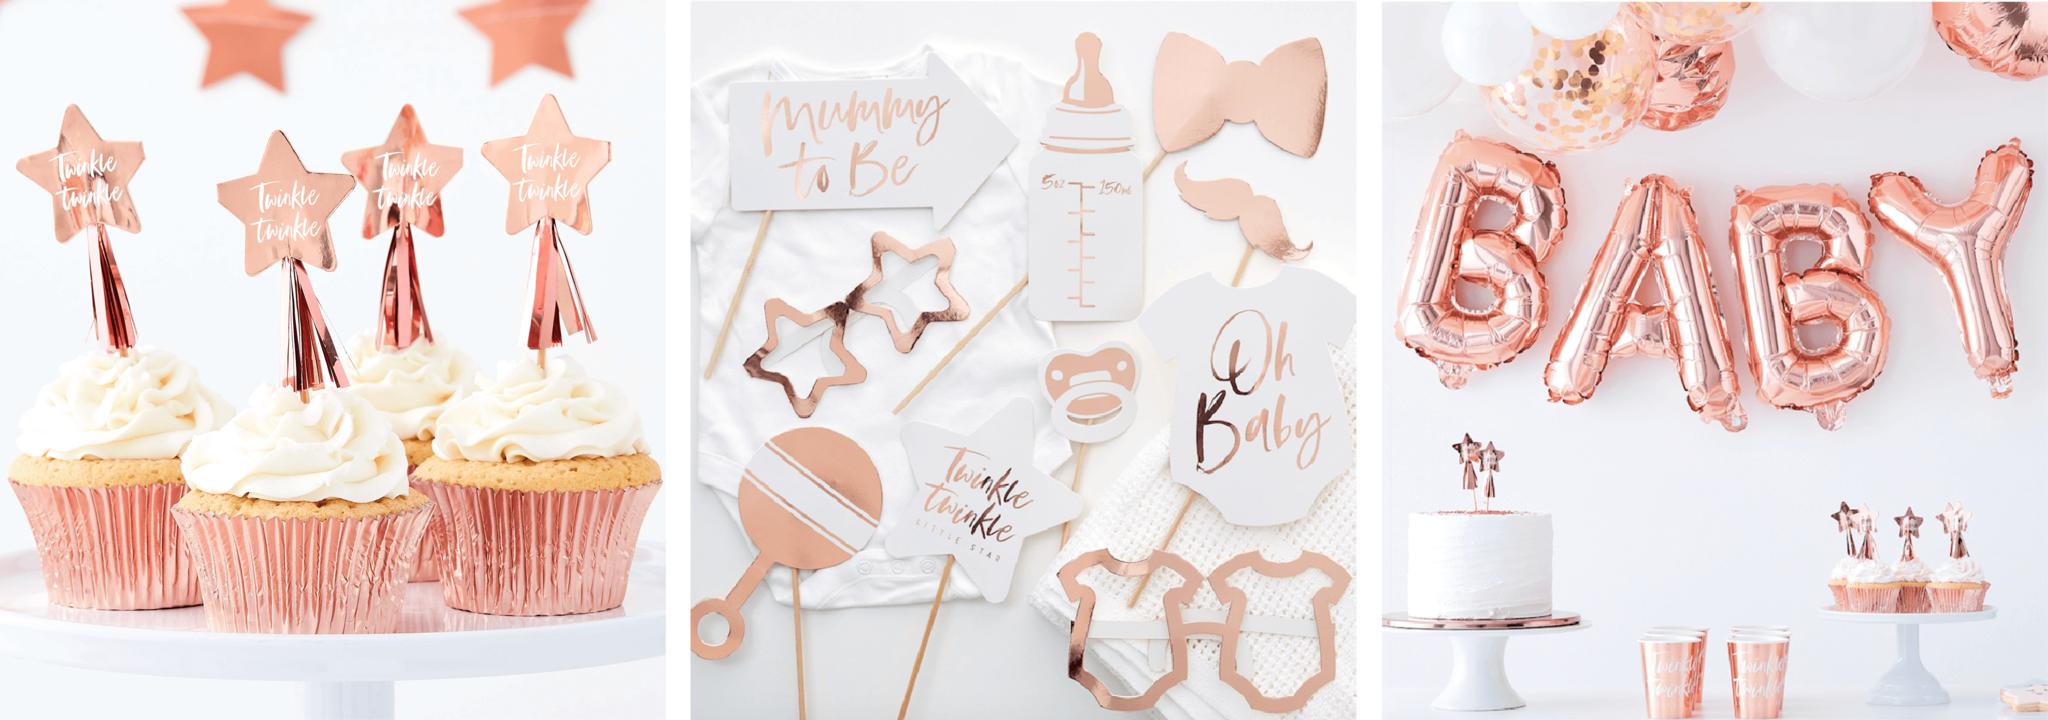 Babyshower versiering rosé goud